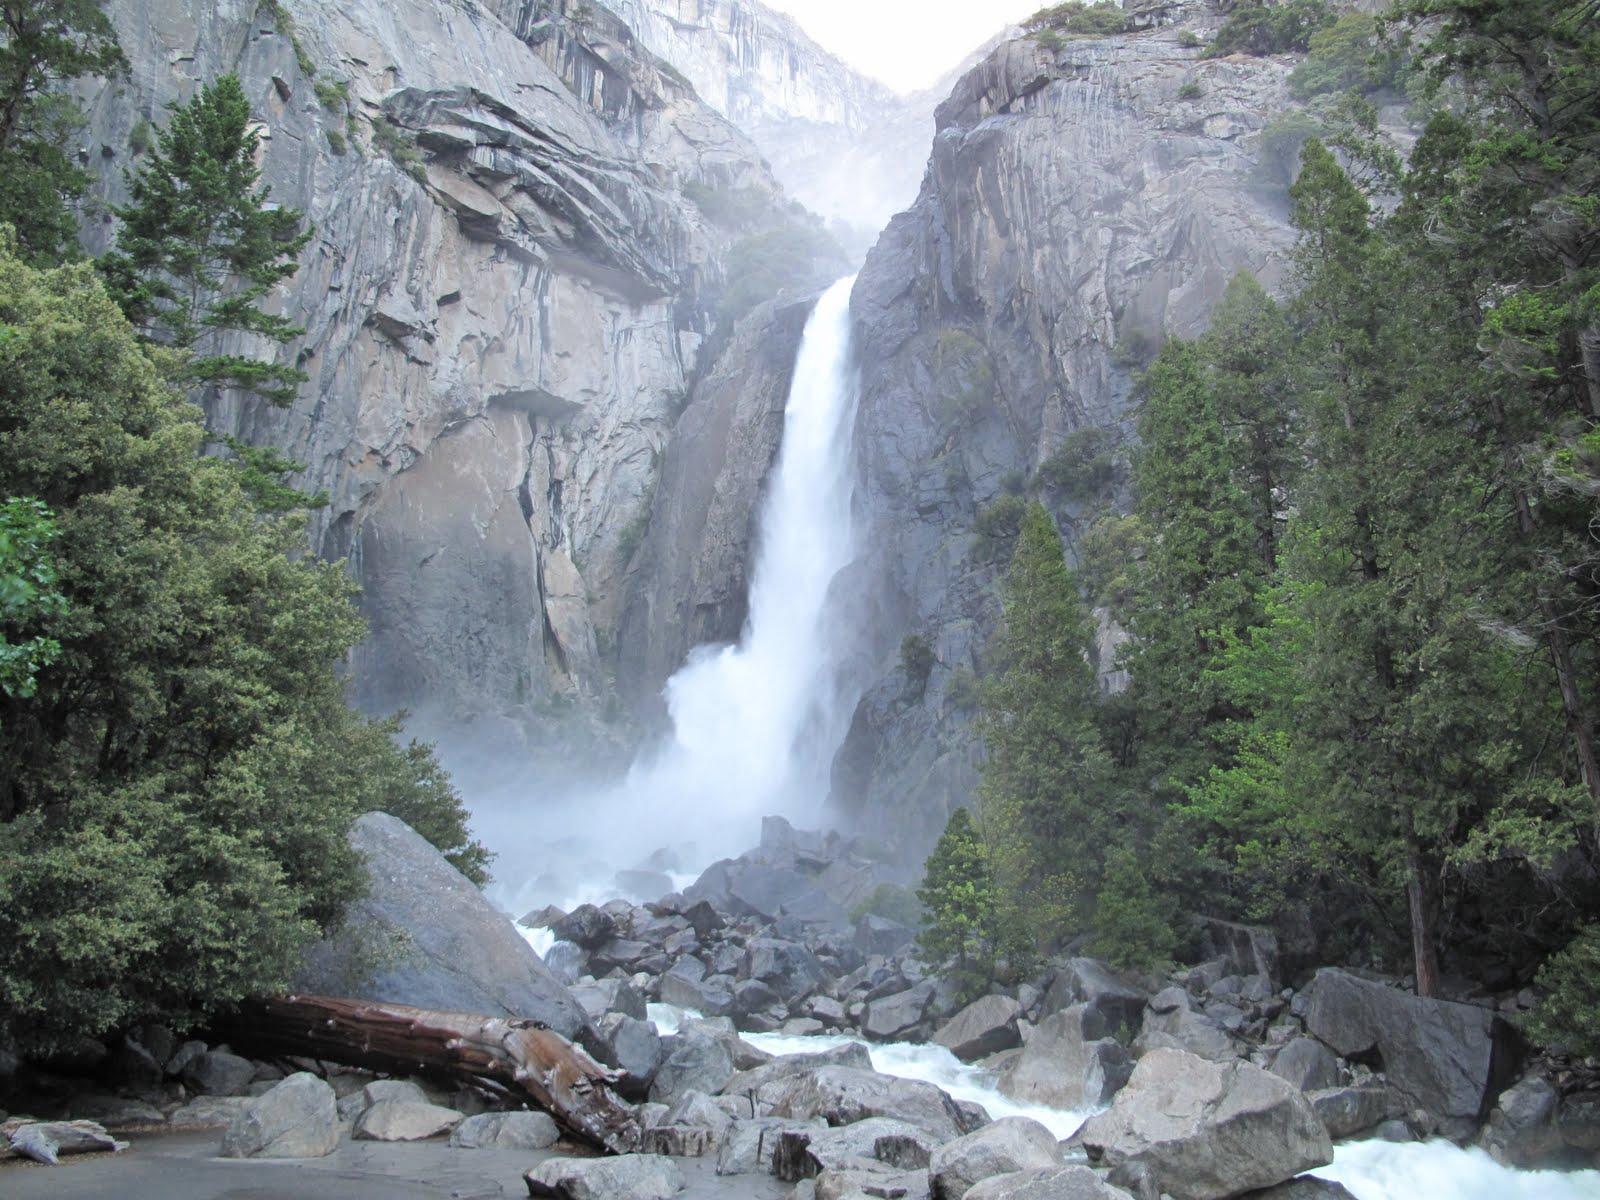 Yosemite National Park Yosemite Weather Yosemite Lodging